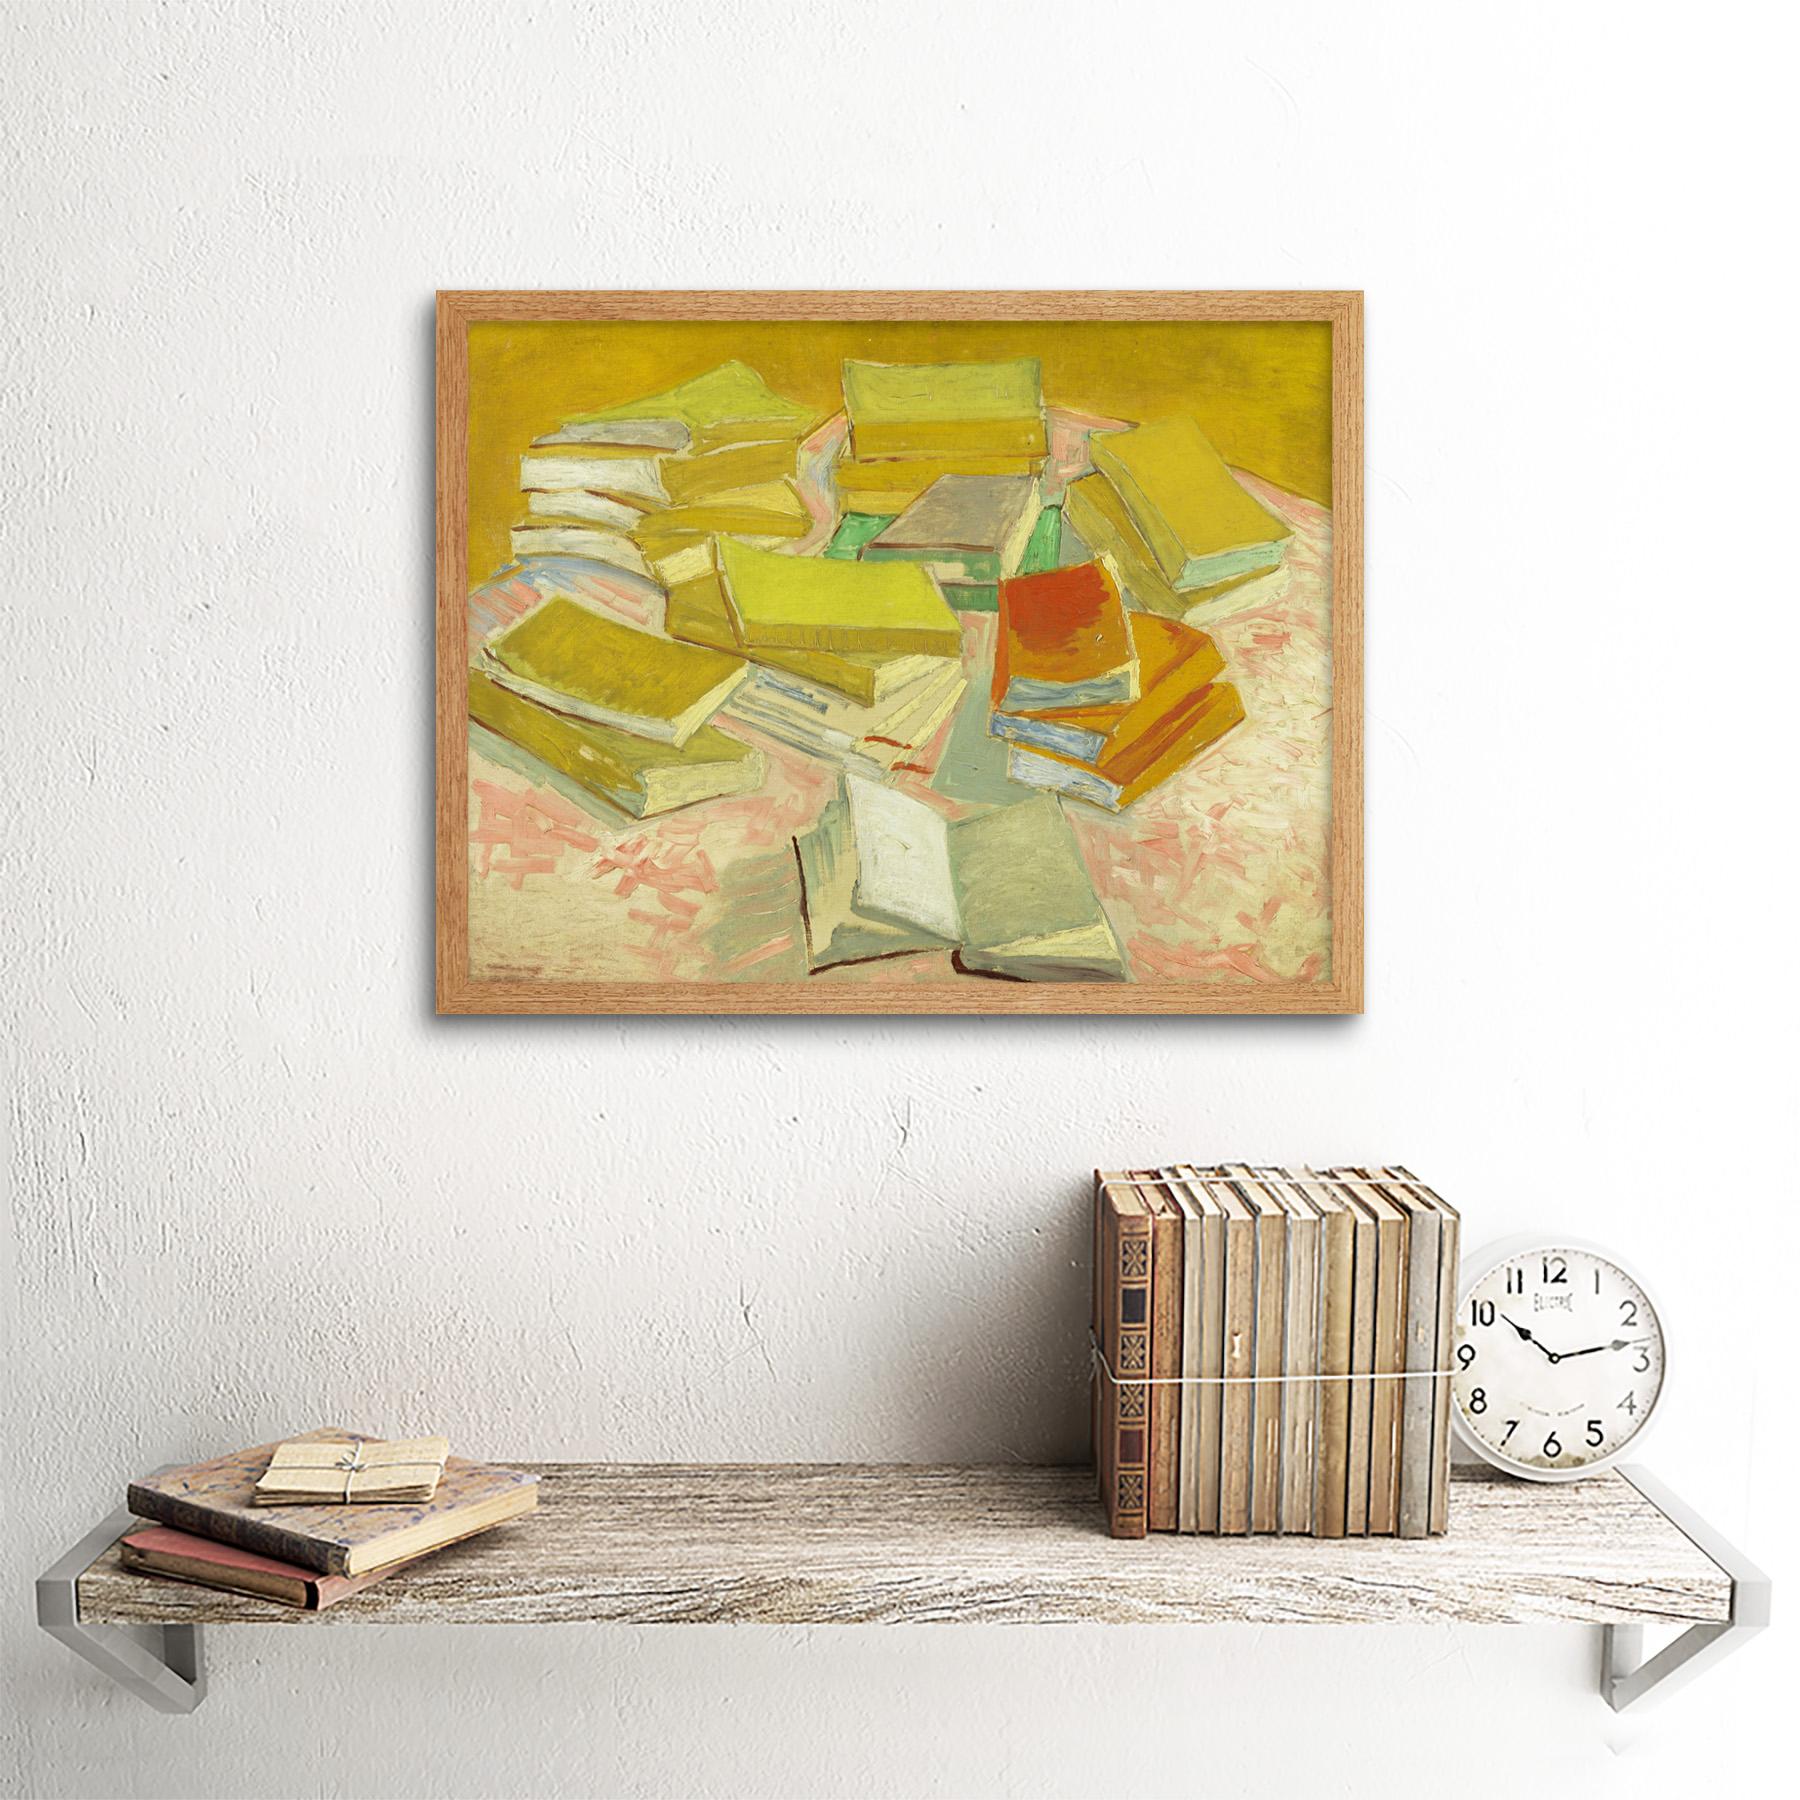 thumbnail 13 - Vincent-Van-Gogh-Piles-Of-French-Novels-Art-Print-Framed-12x16